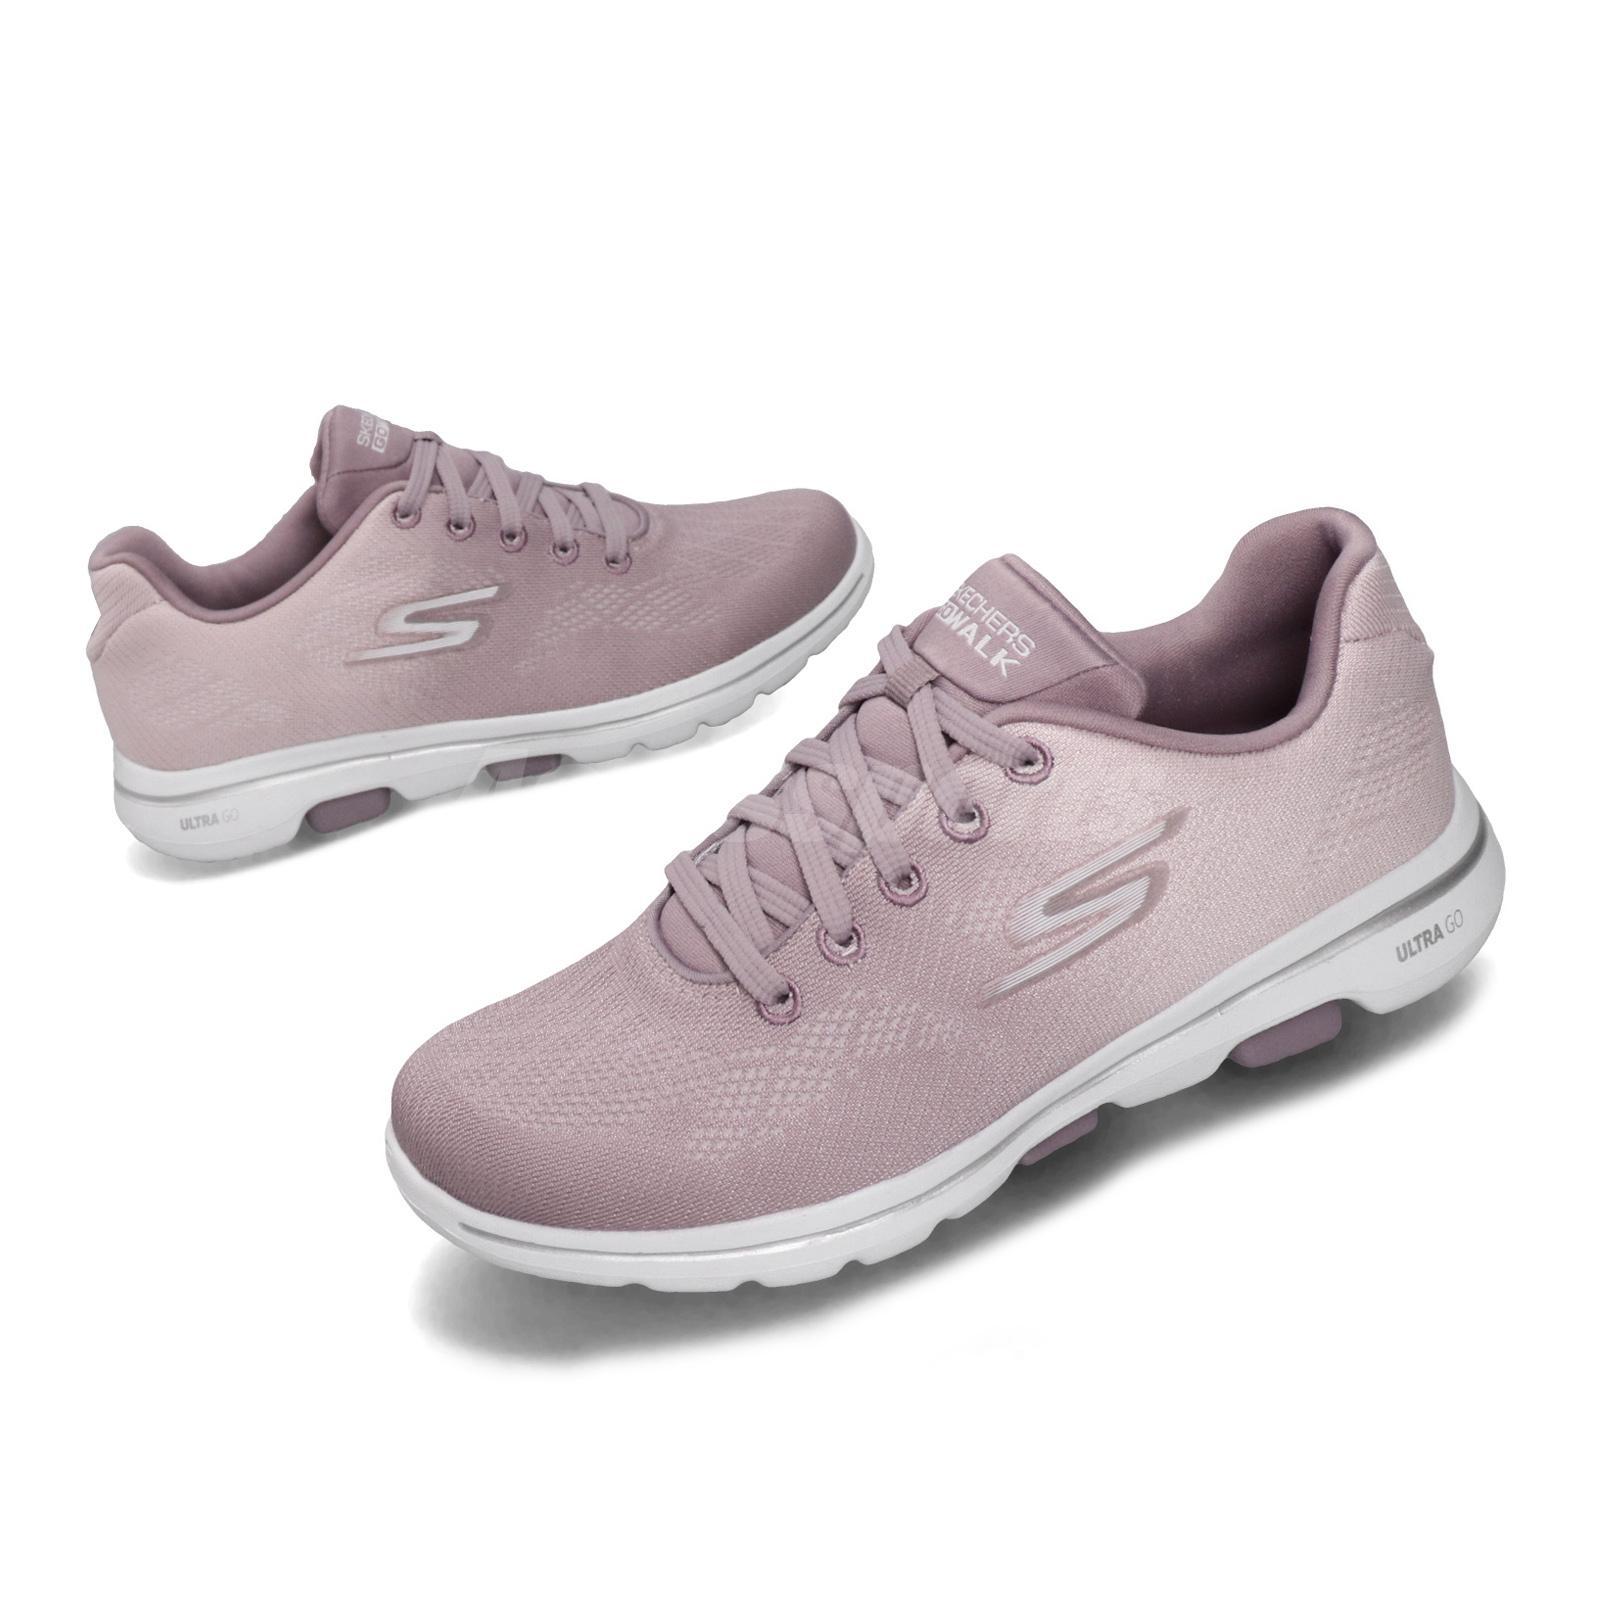 Details about Skechers Go Walk 5 Alive Mauve Purple White Women Running Shoe Sneaker 15929 MVE